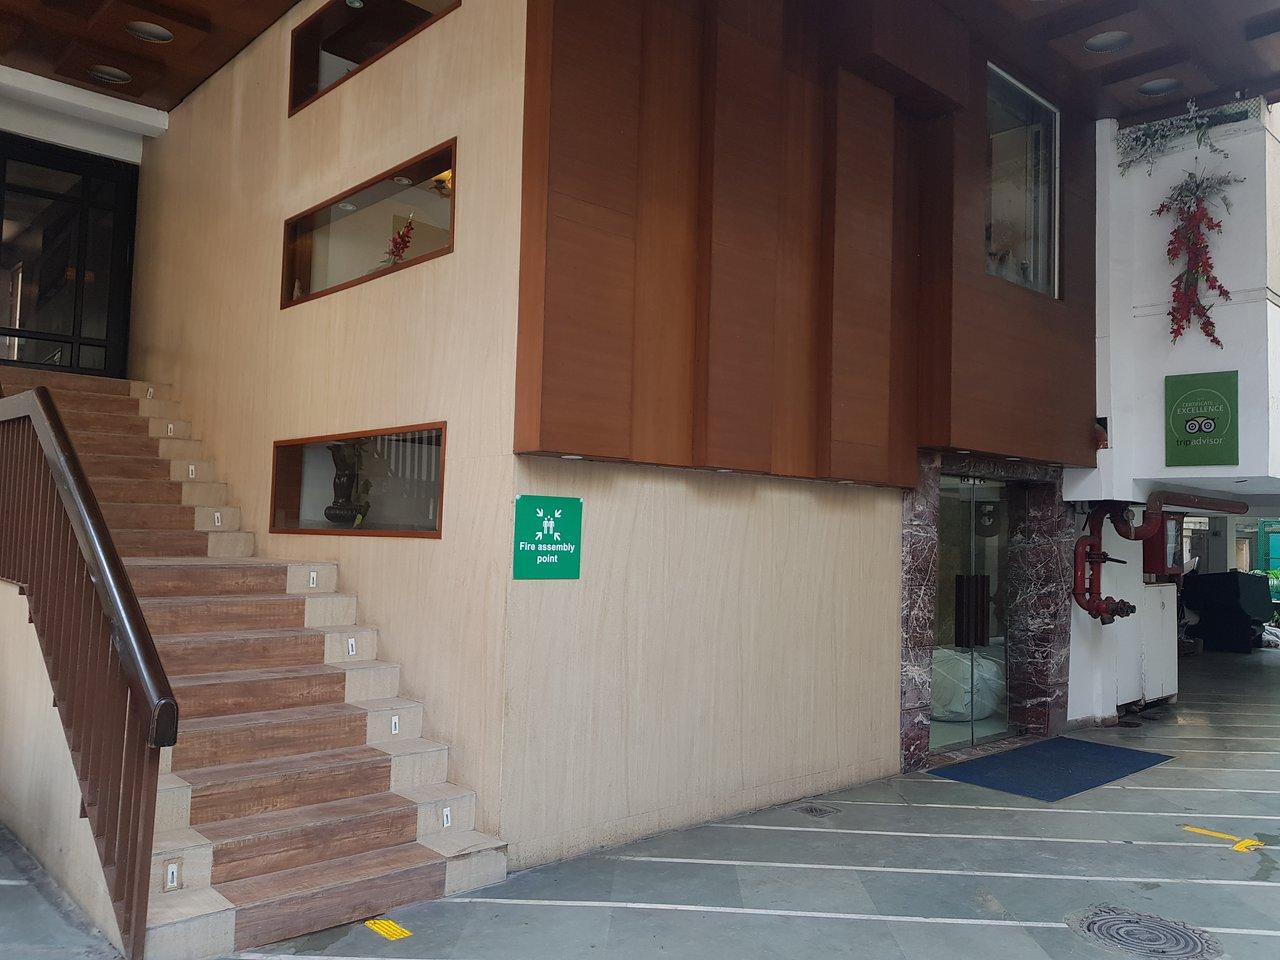 ROLAND HOTEL (Kolkata, West Bengal) - Hotel Reviews, Photos